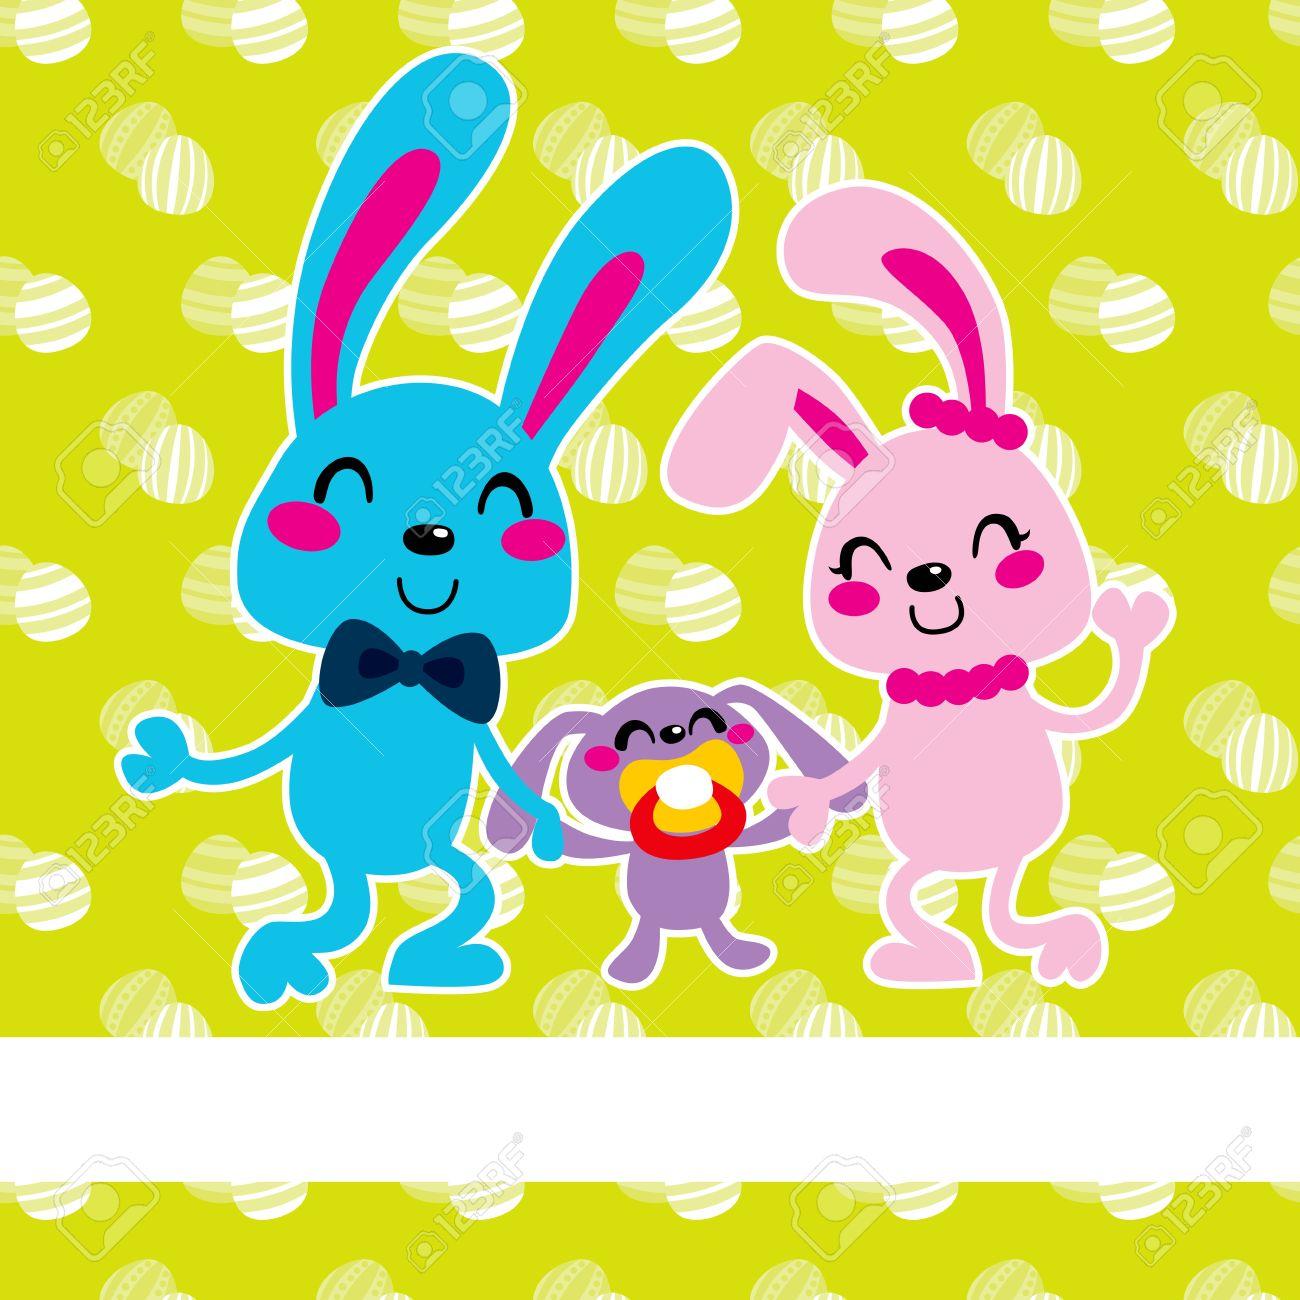 Adorable Happy Easter Bunny Family Celebrating Celebrating.